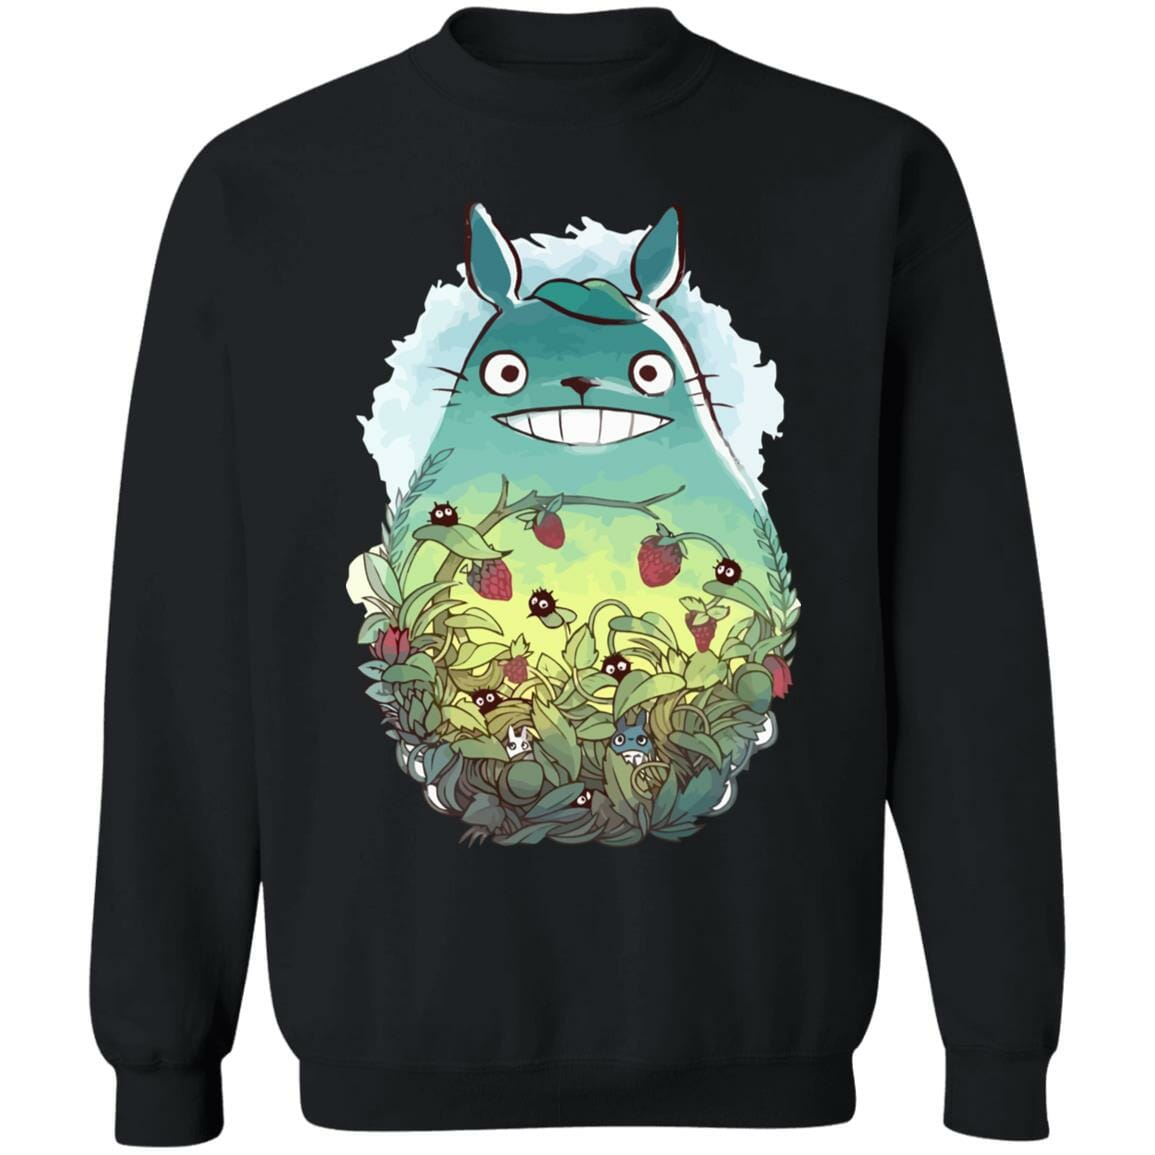 My Neighbor Totoro – Green Garden Sweatshirt